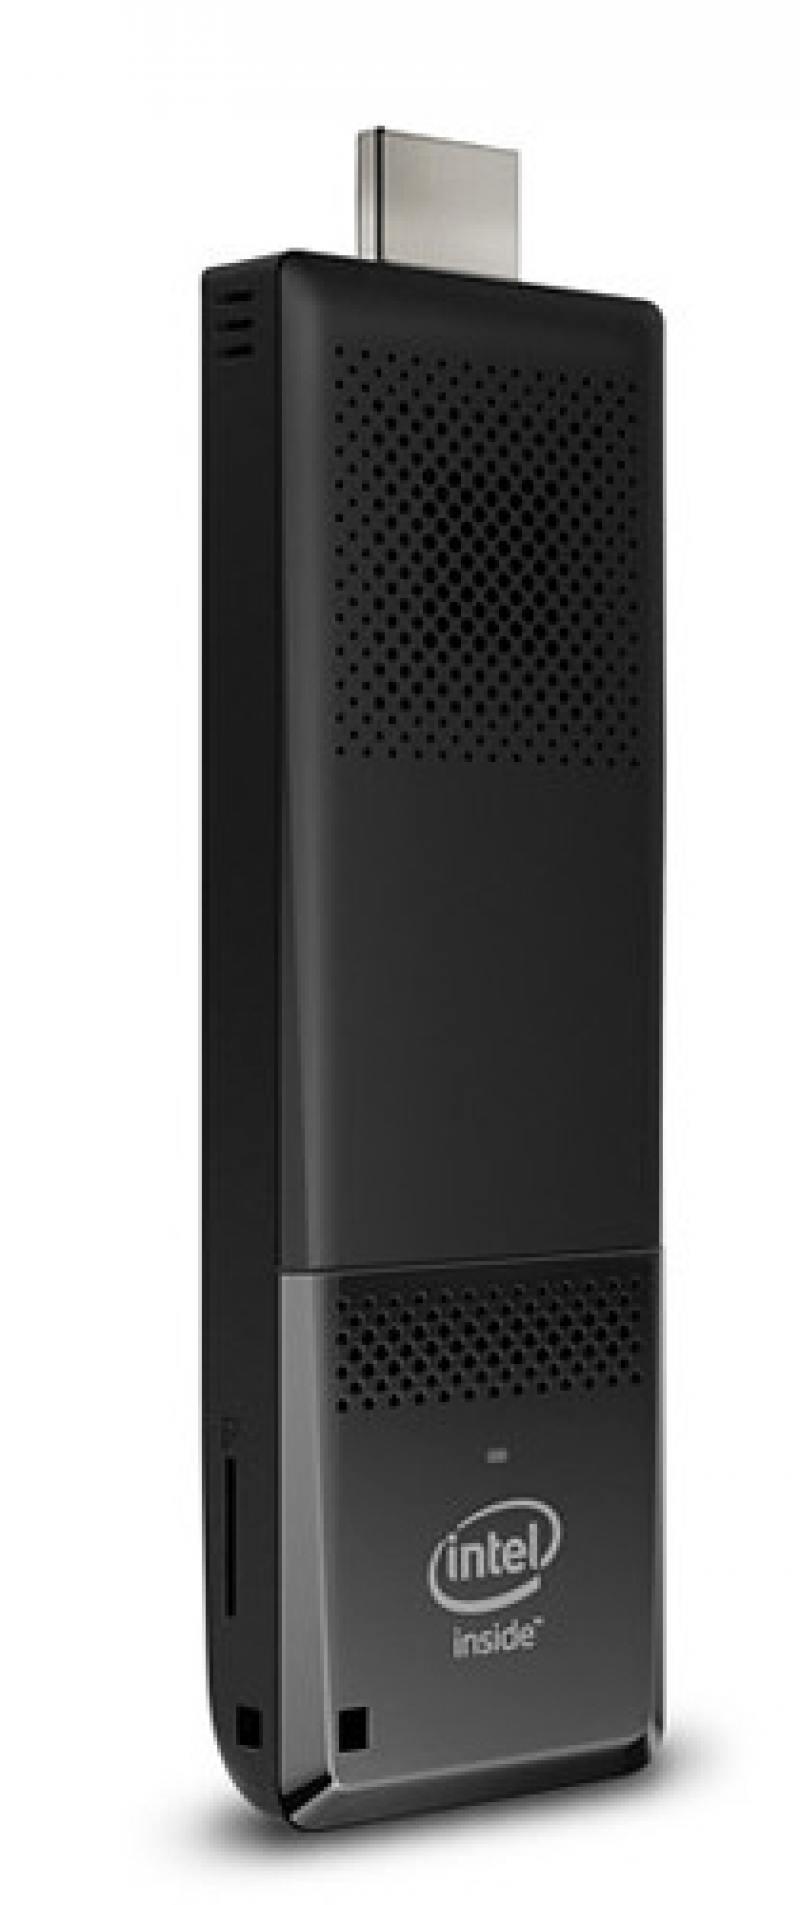 Платформа INTEL Compute Stick BOXSTK2M3W64CC Black / Intel Core m3-6Y30 2.2GHz / 4GB / 64GB eMMC / HD 515 /Win 10 Home цены